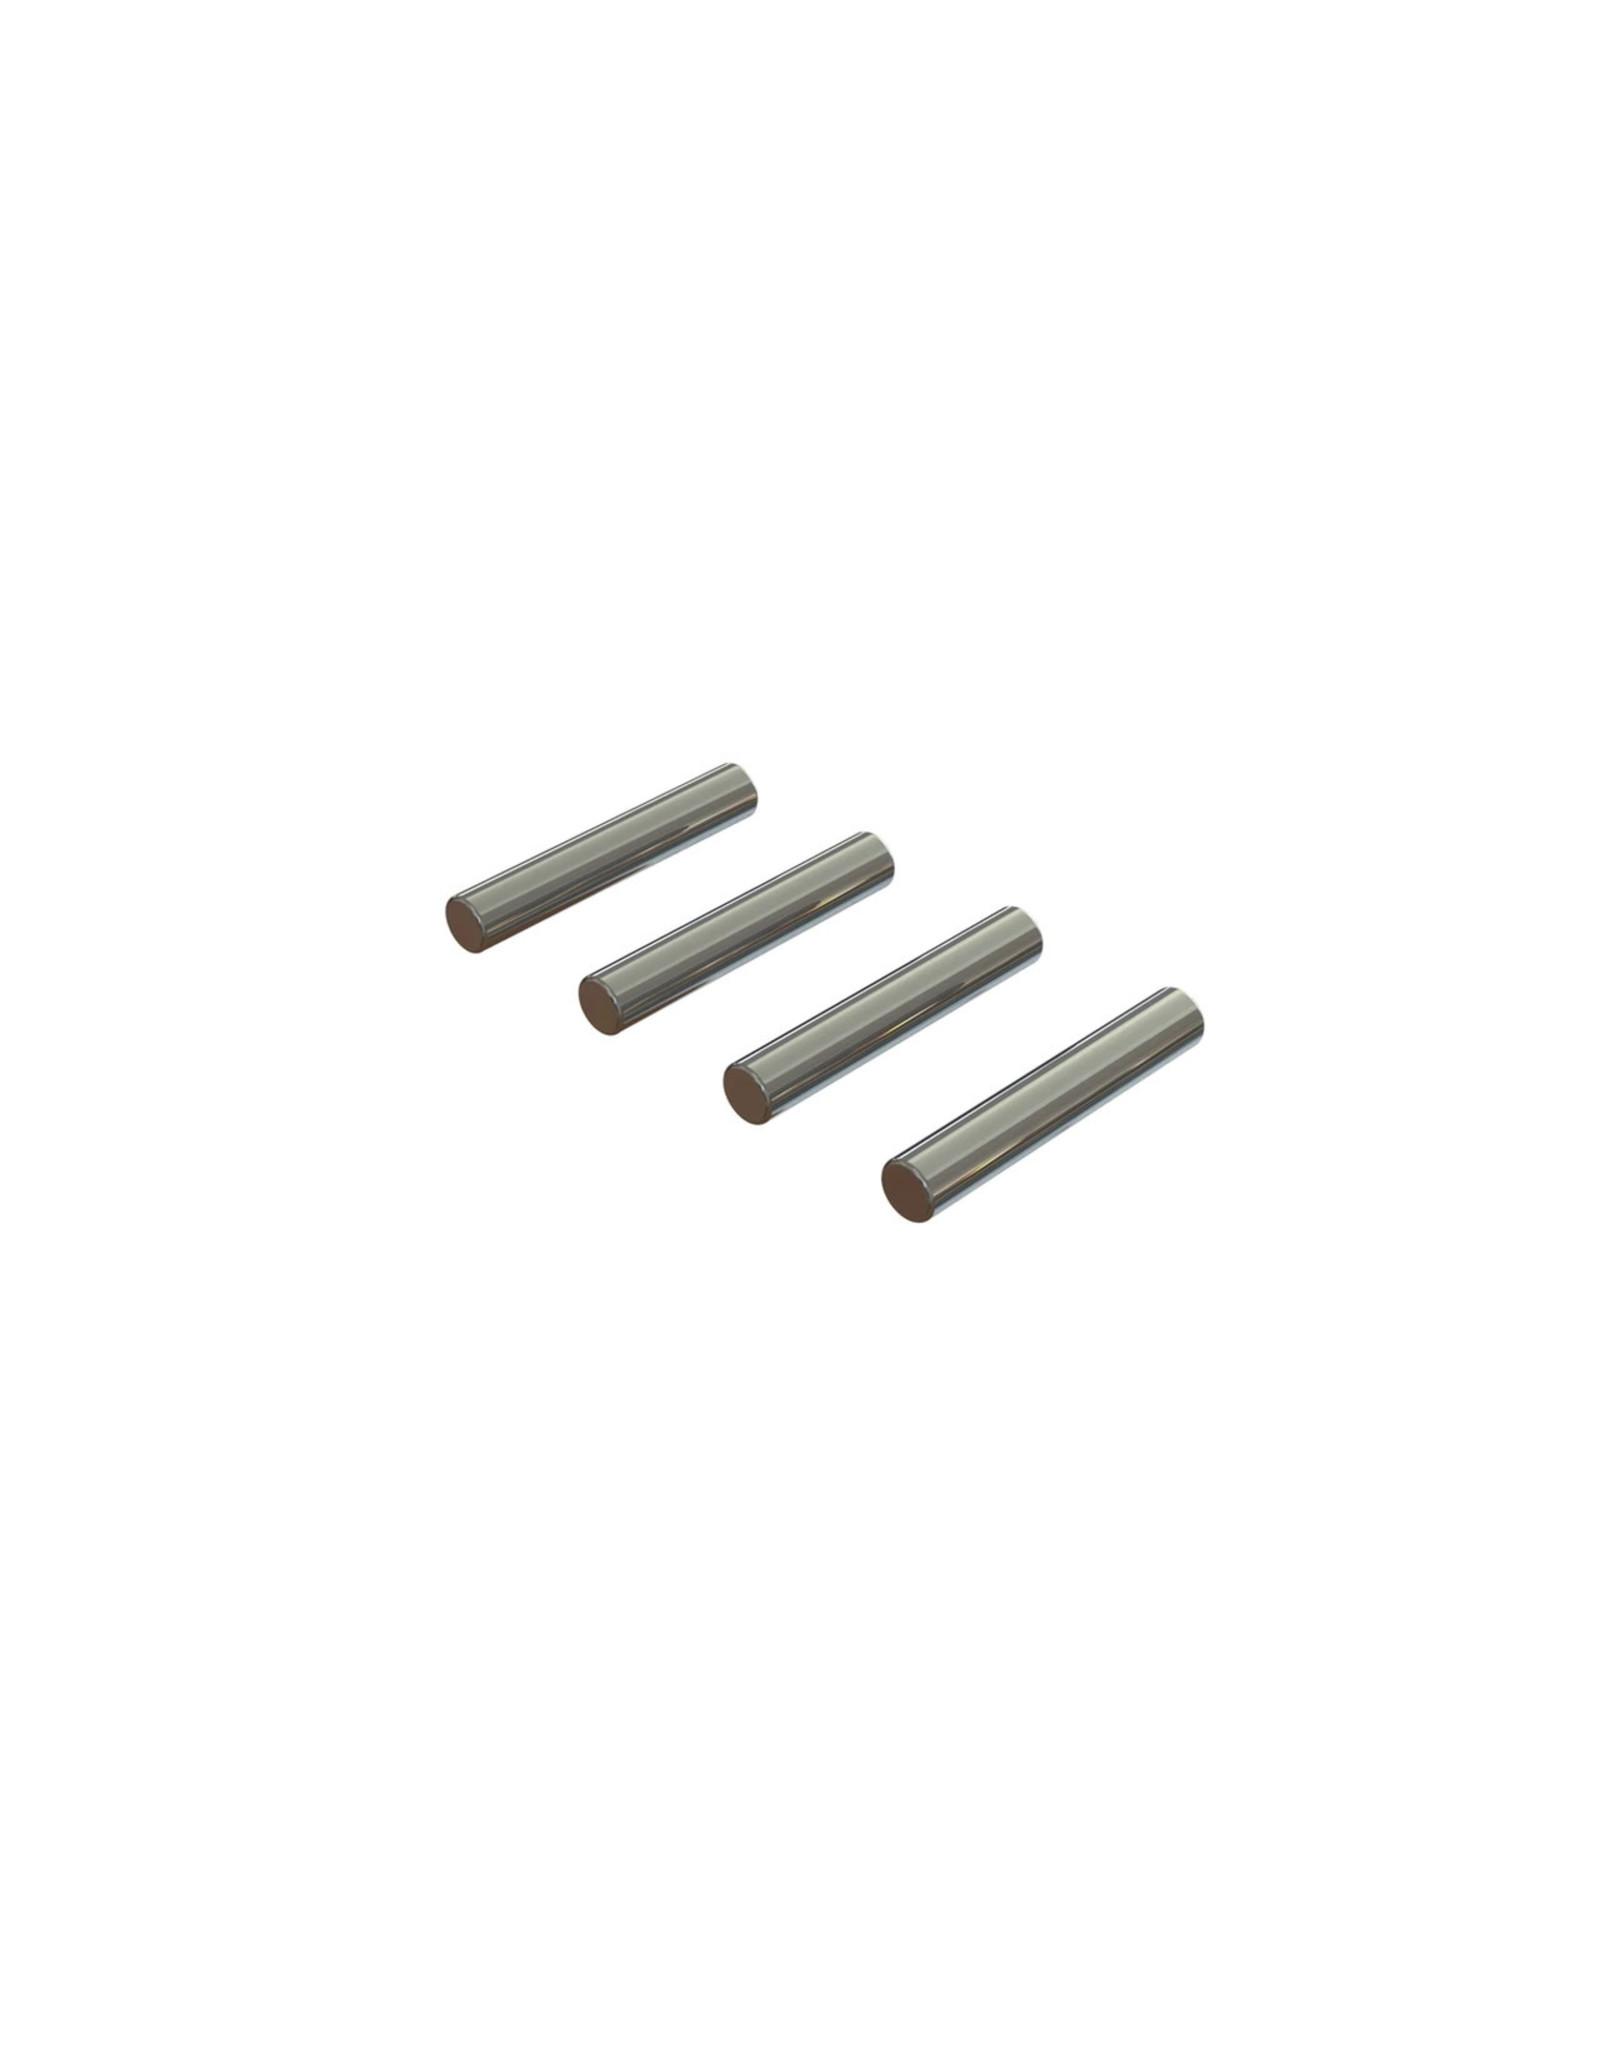 Arrma AR713029 - Pin Set 2.5x15.2mm - (4)